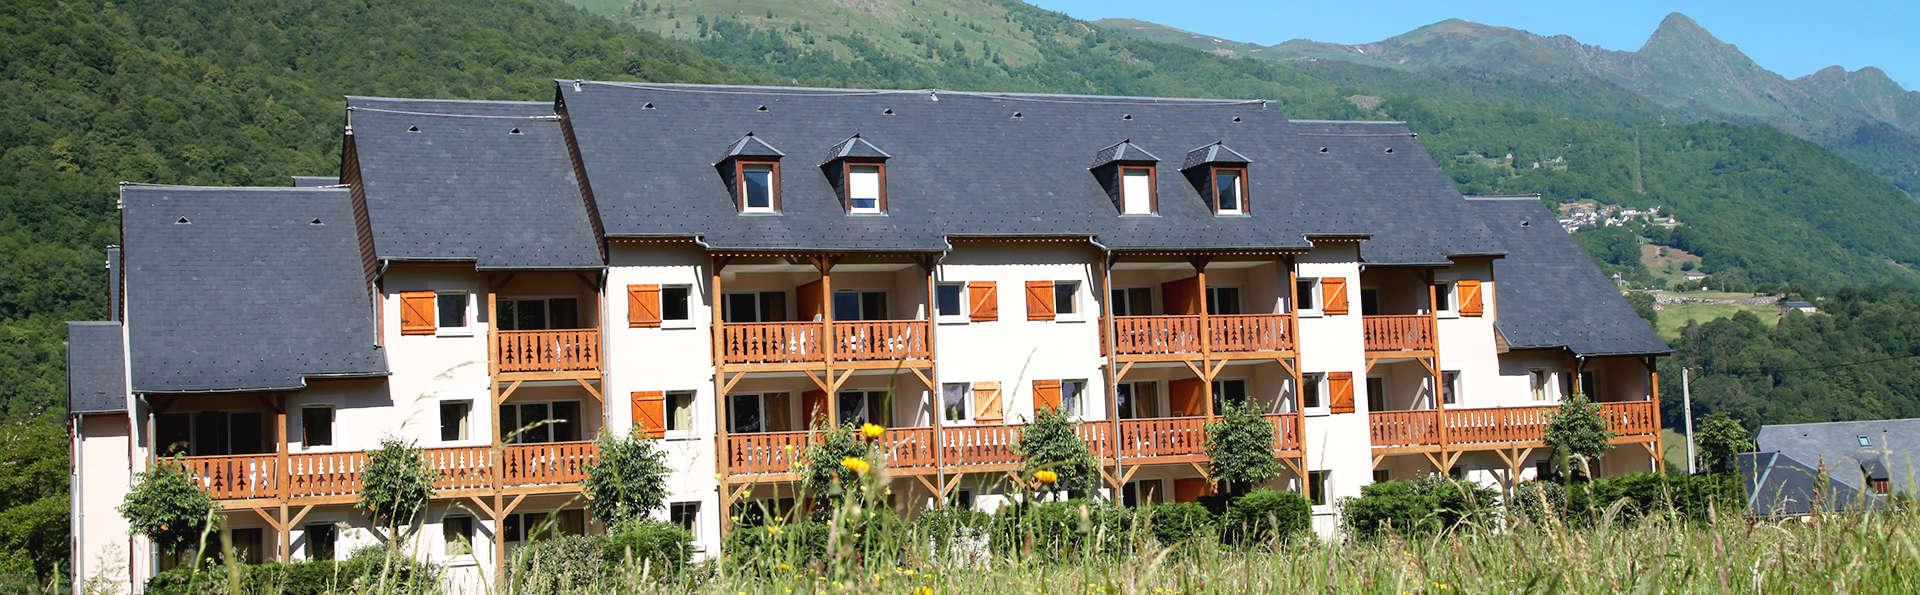 Domaine du Val de Roland - EDIT_Fachada_1.jpg